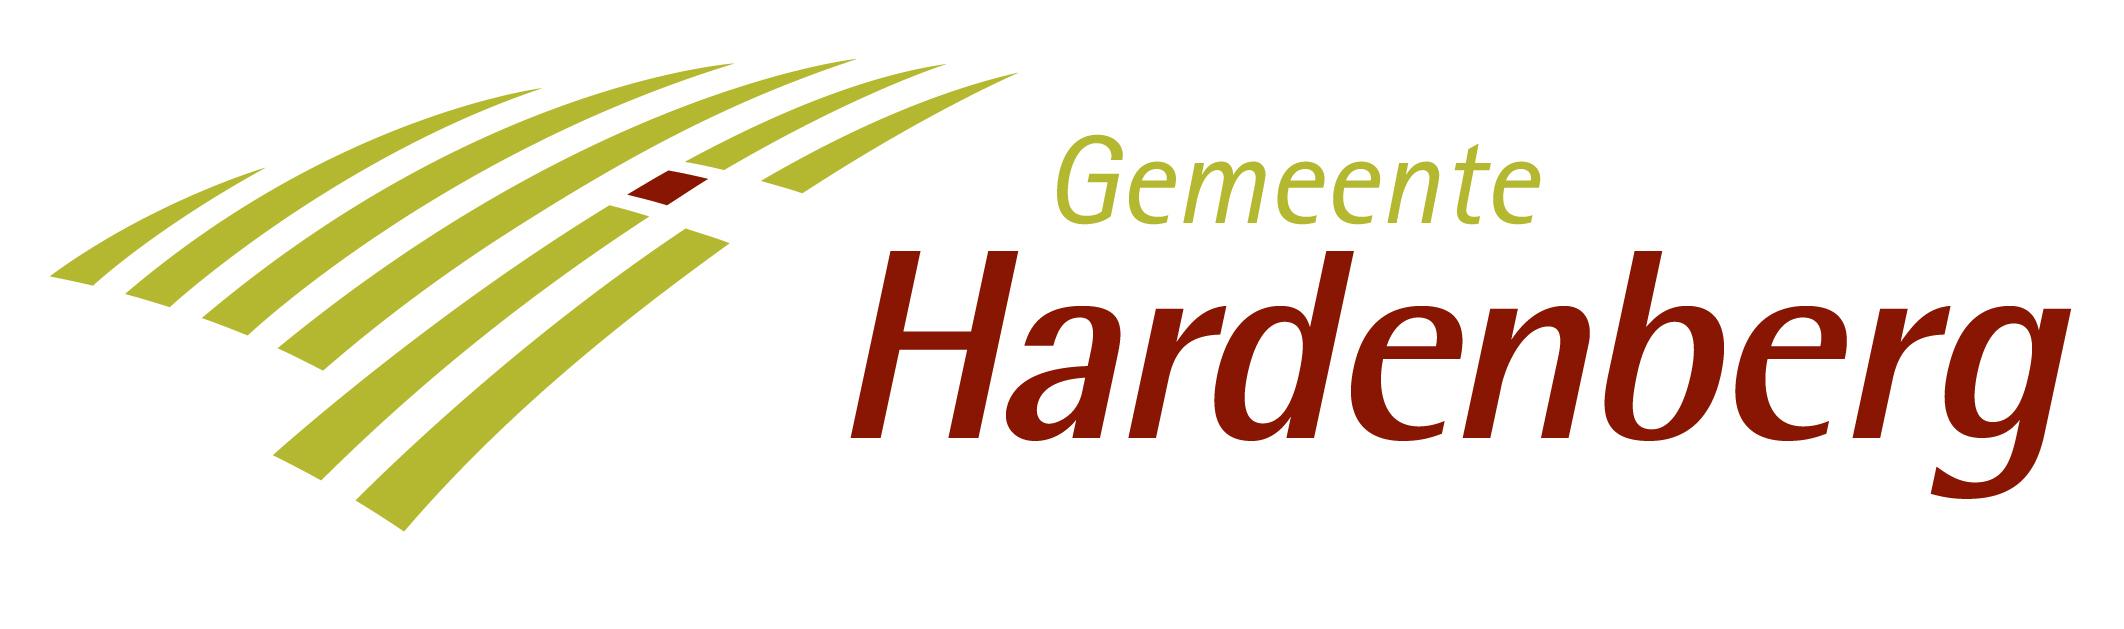 BASE 2008 logo Gemeente Hardenberg